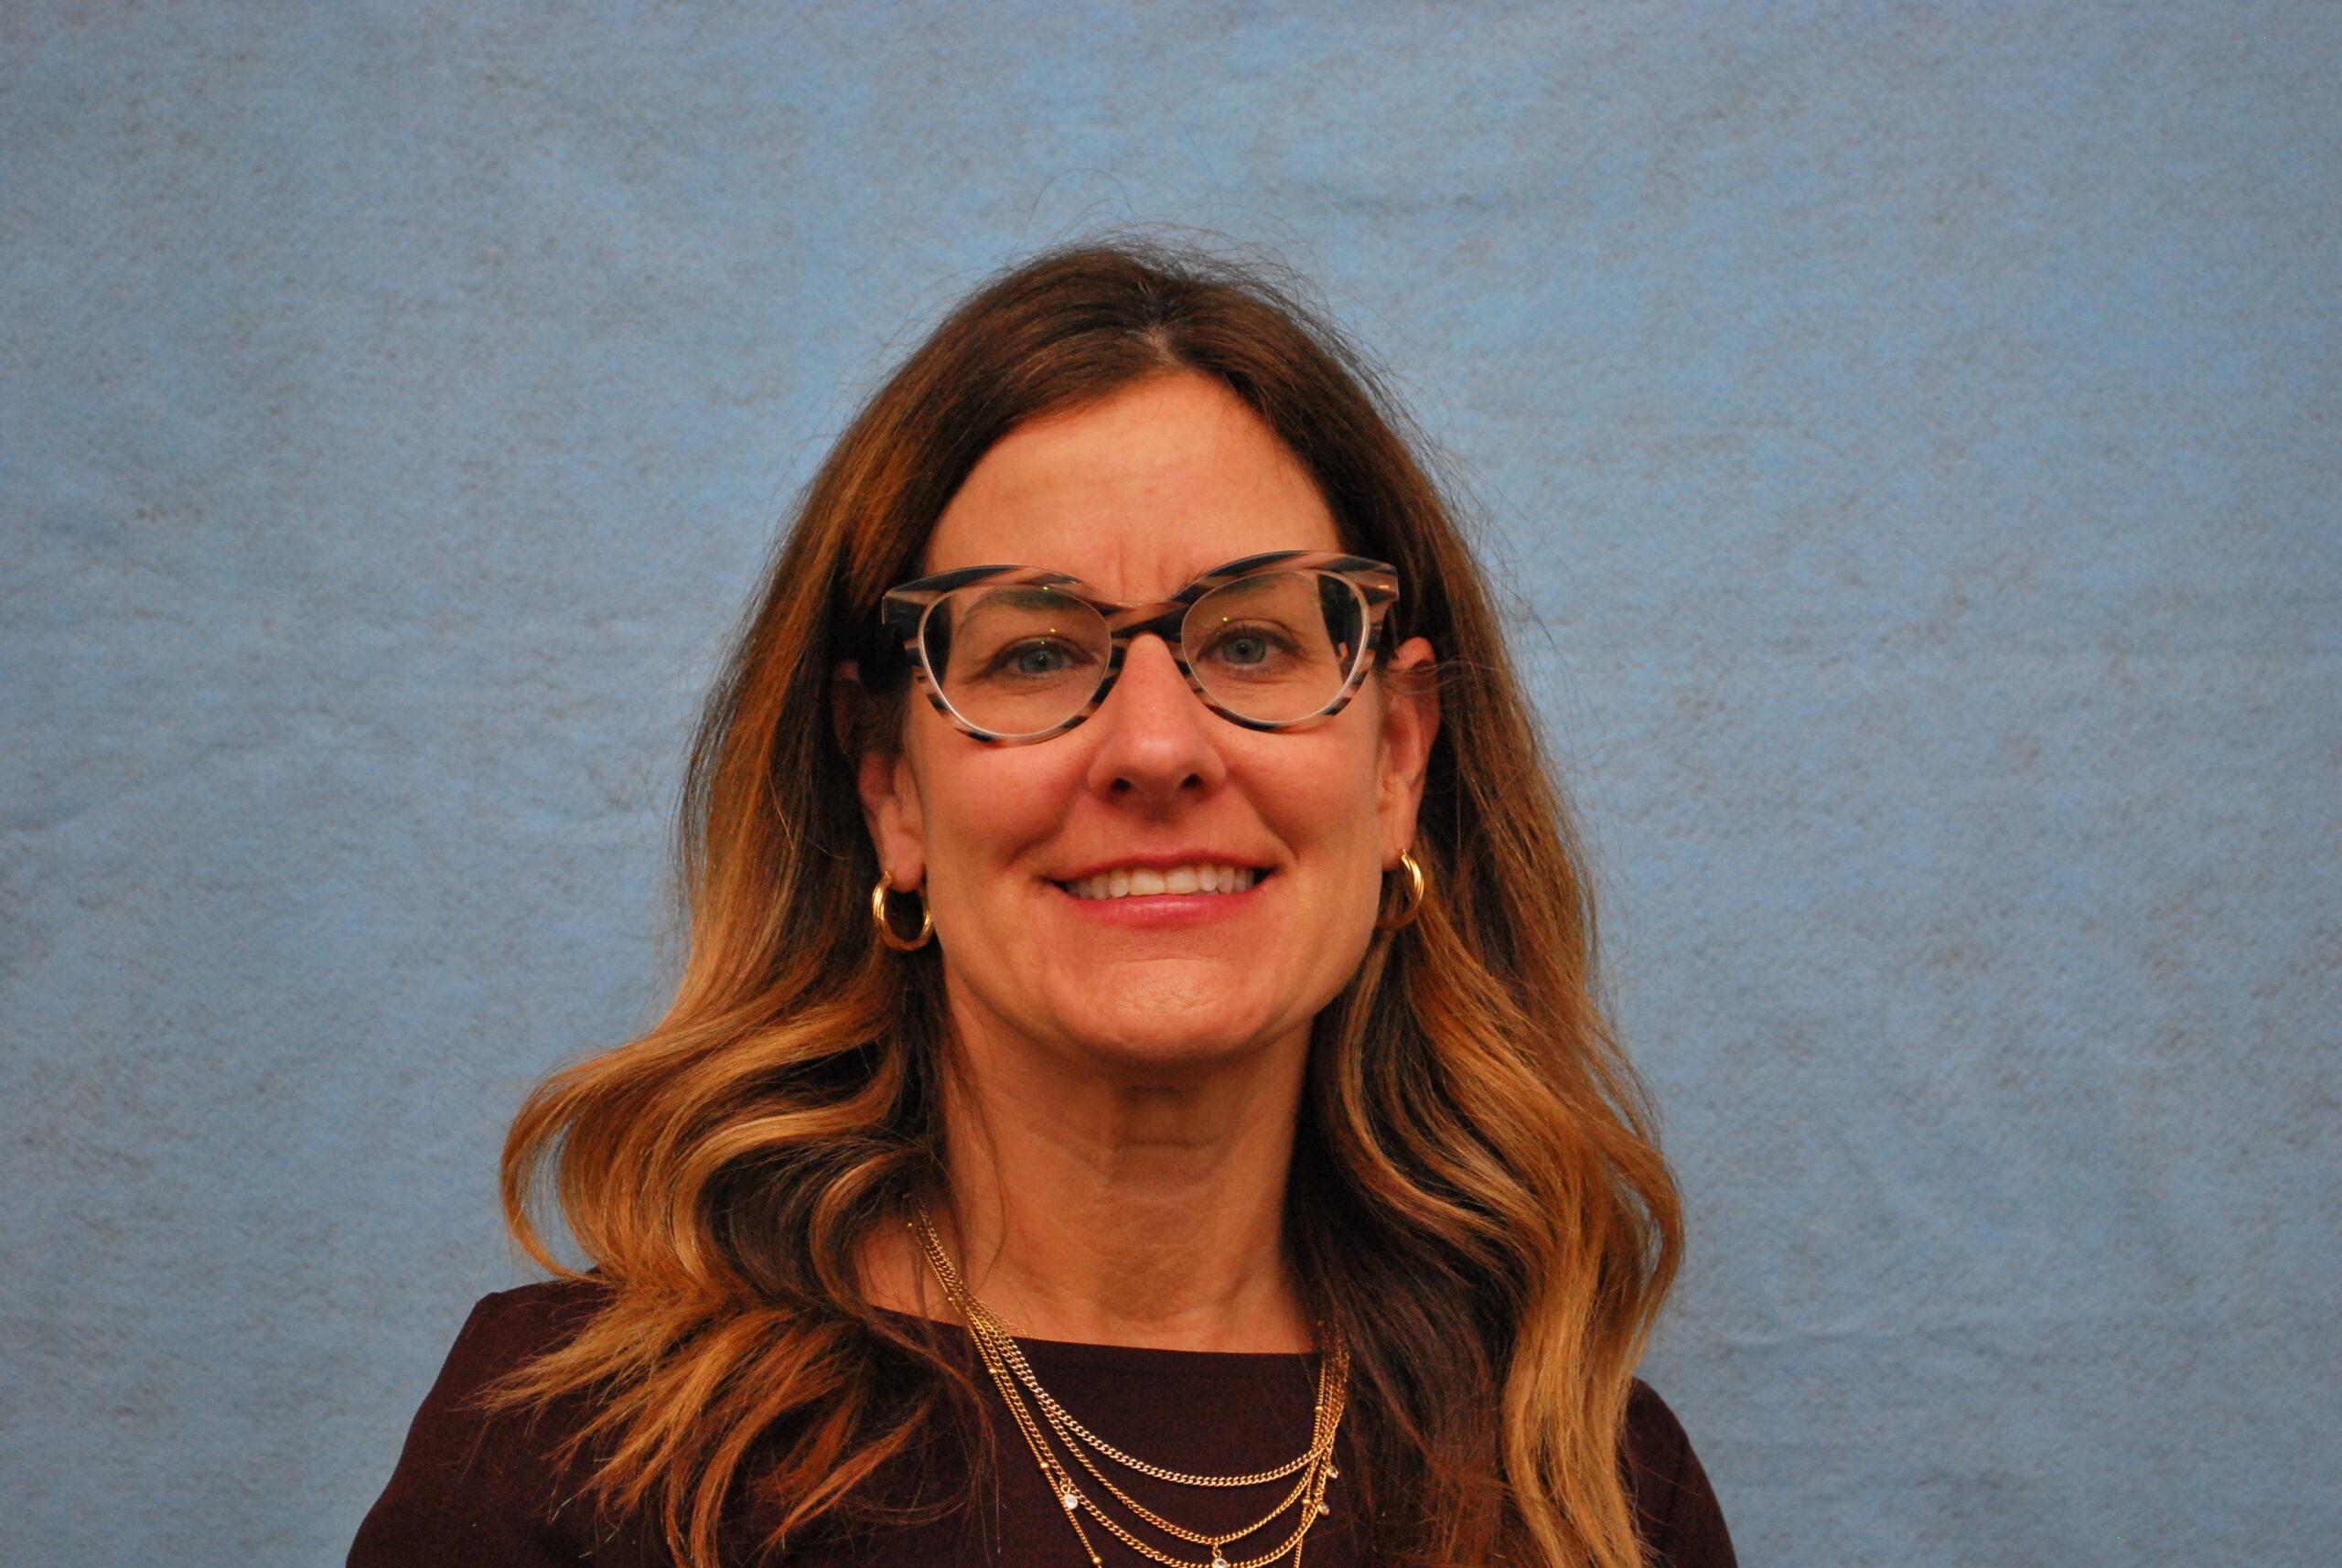 Cathy Salvaggio Buckert